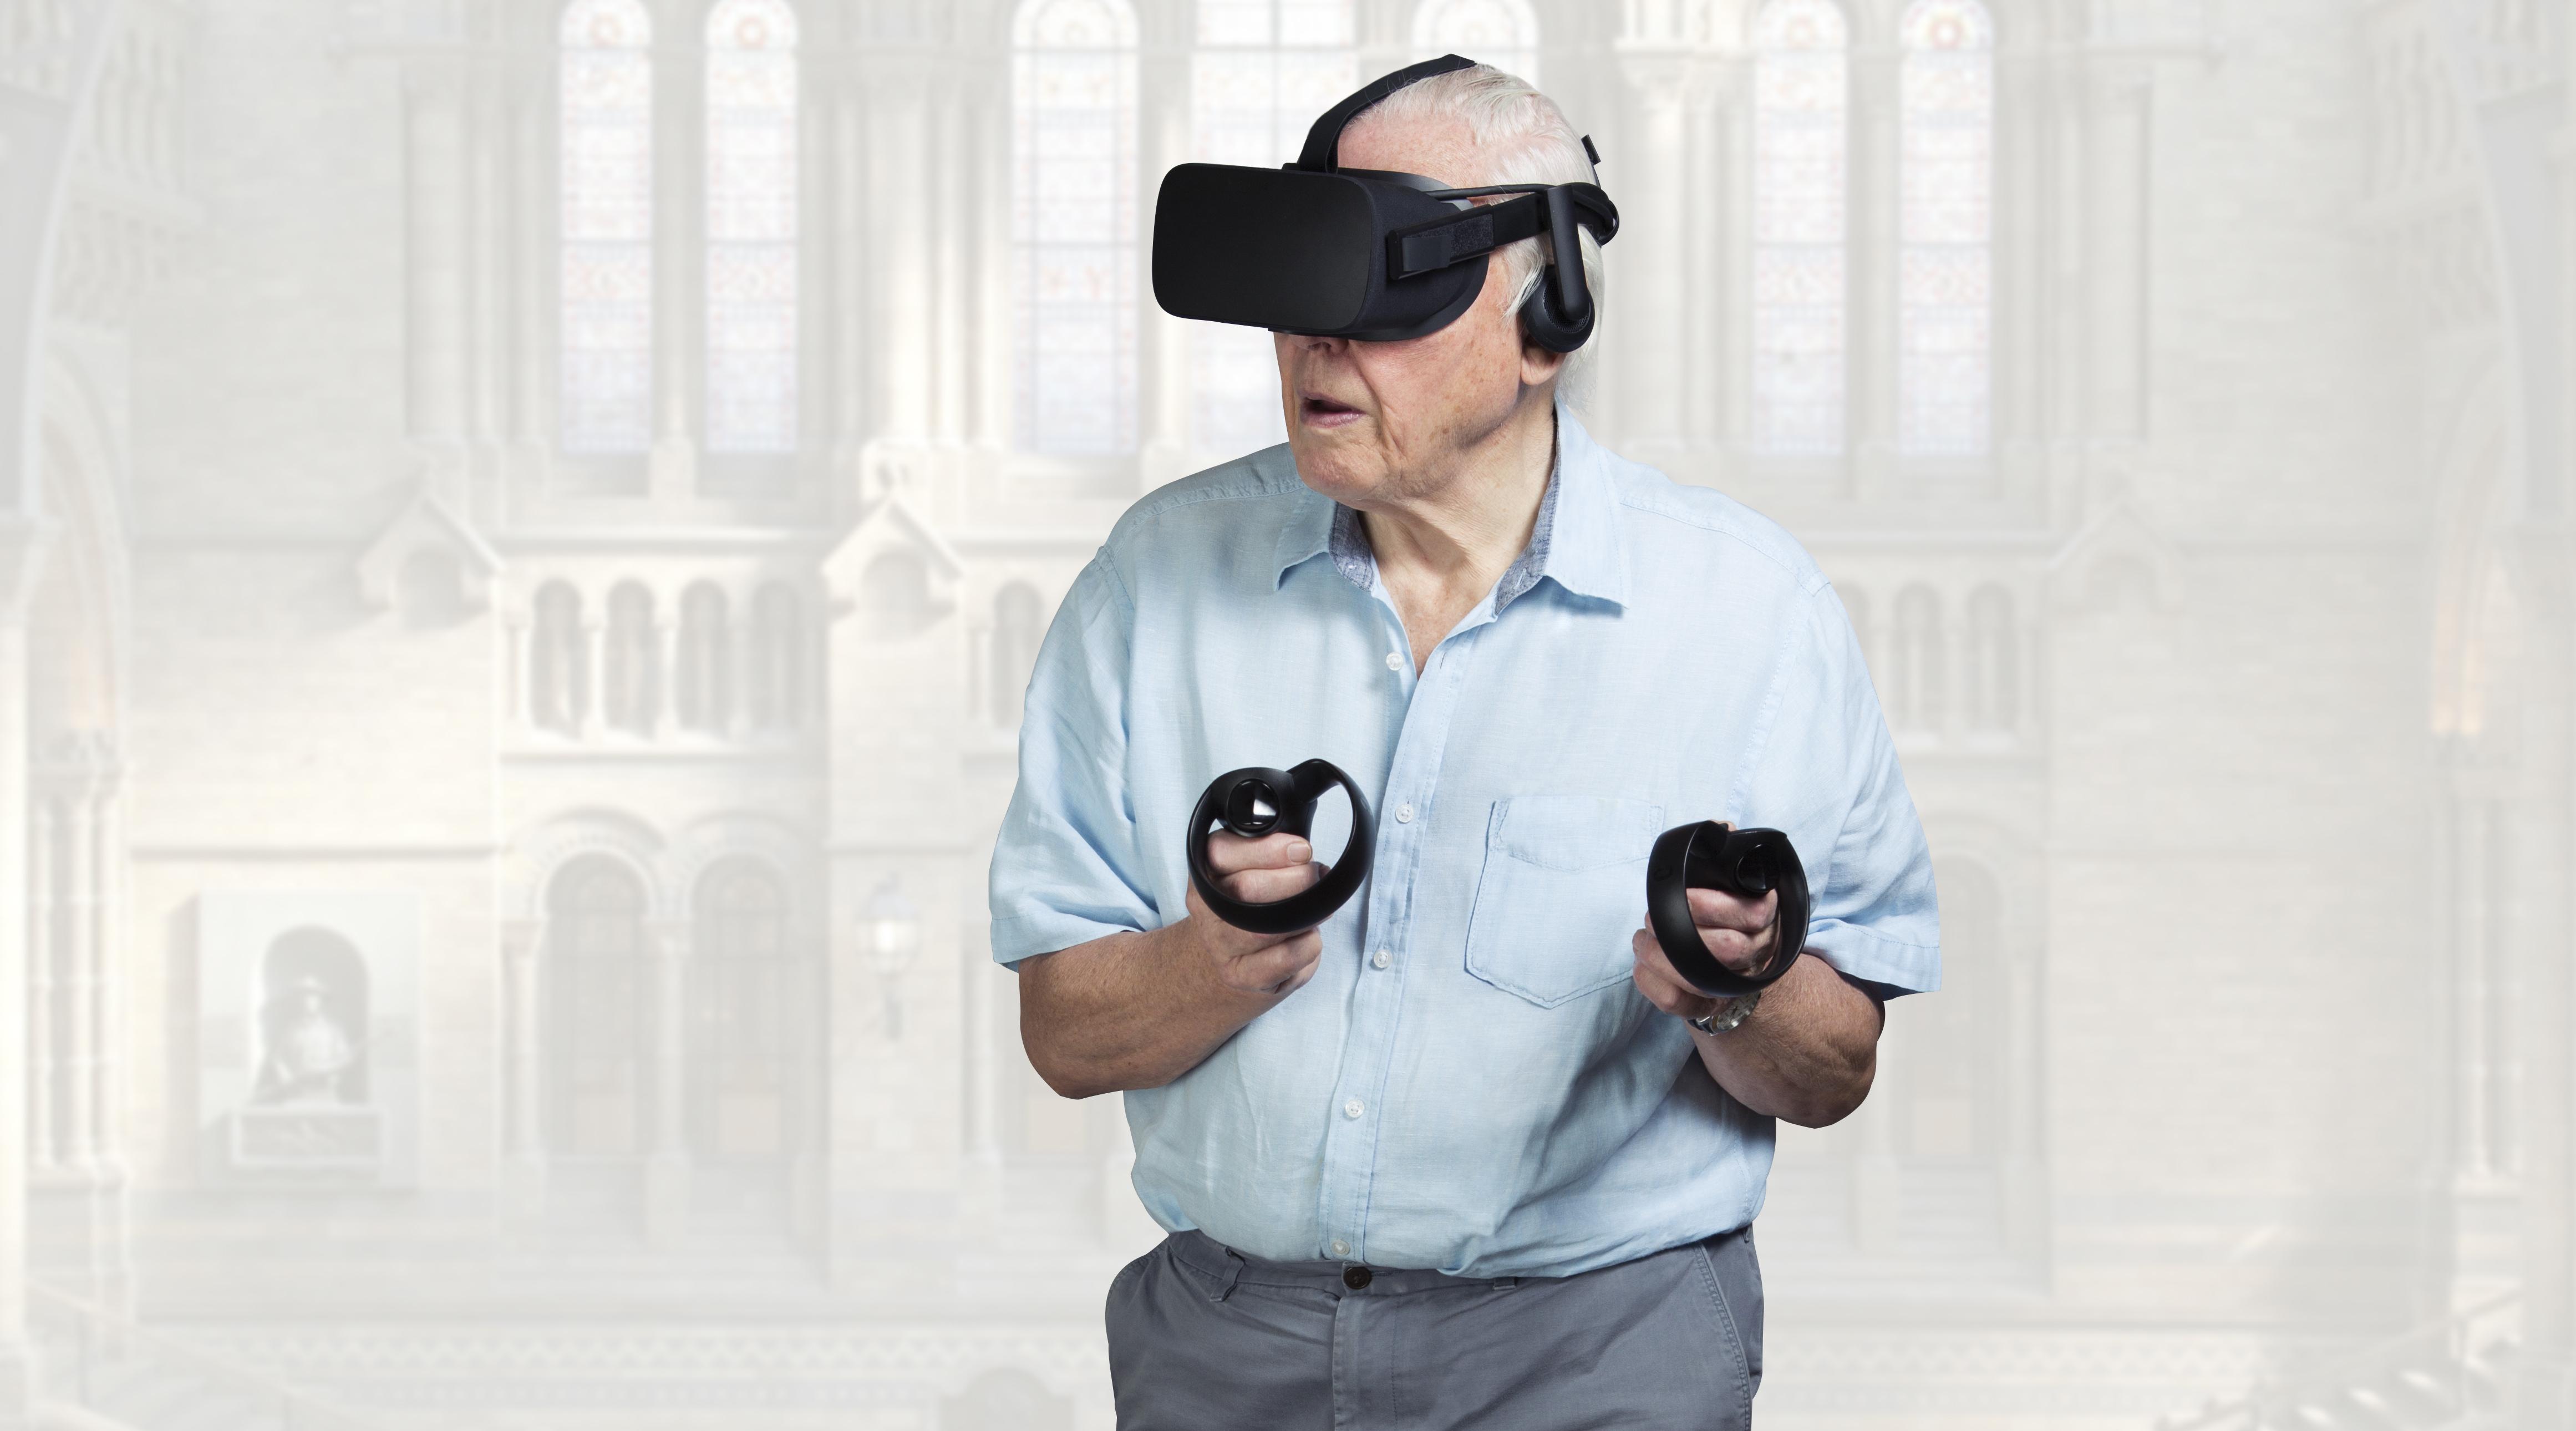 David Attenborough explaining rocks in VR will be incredibly calming